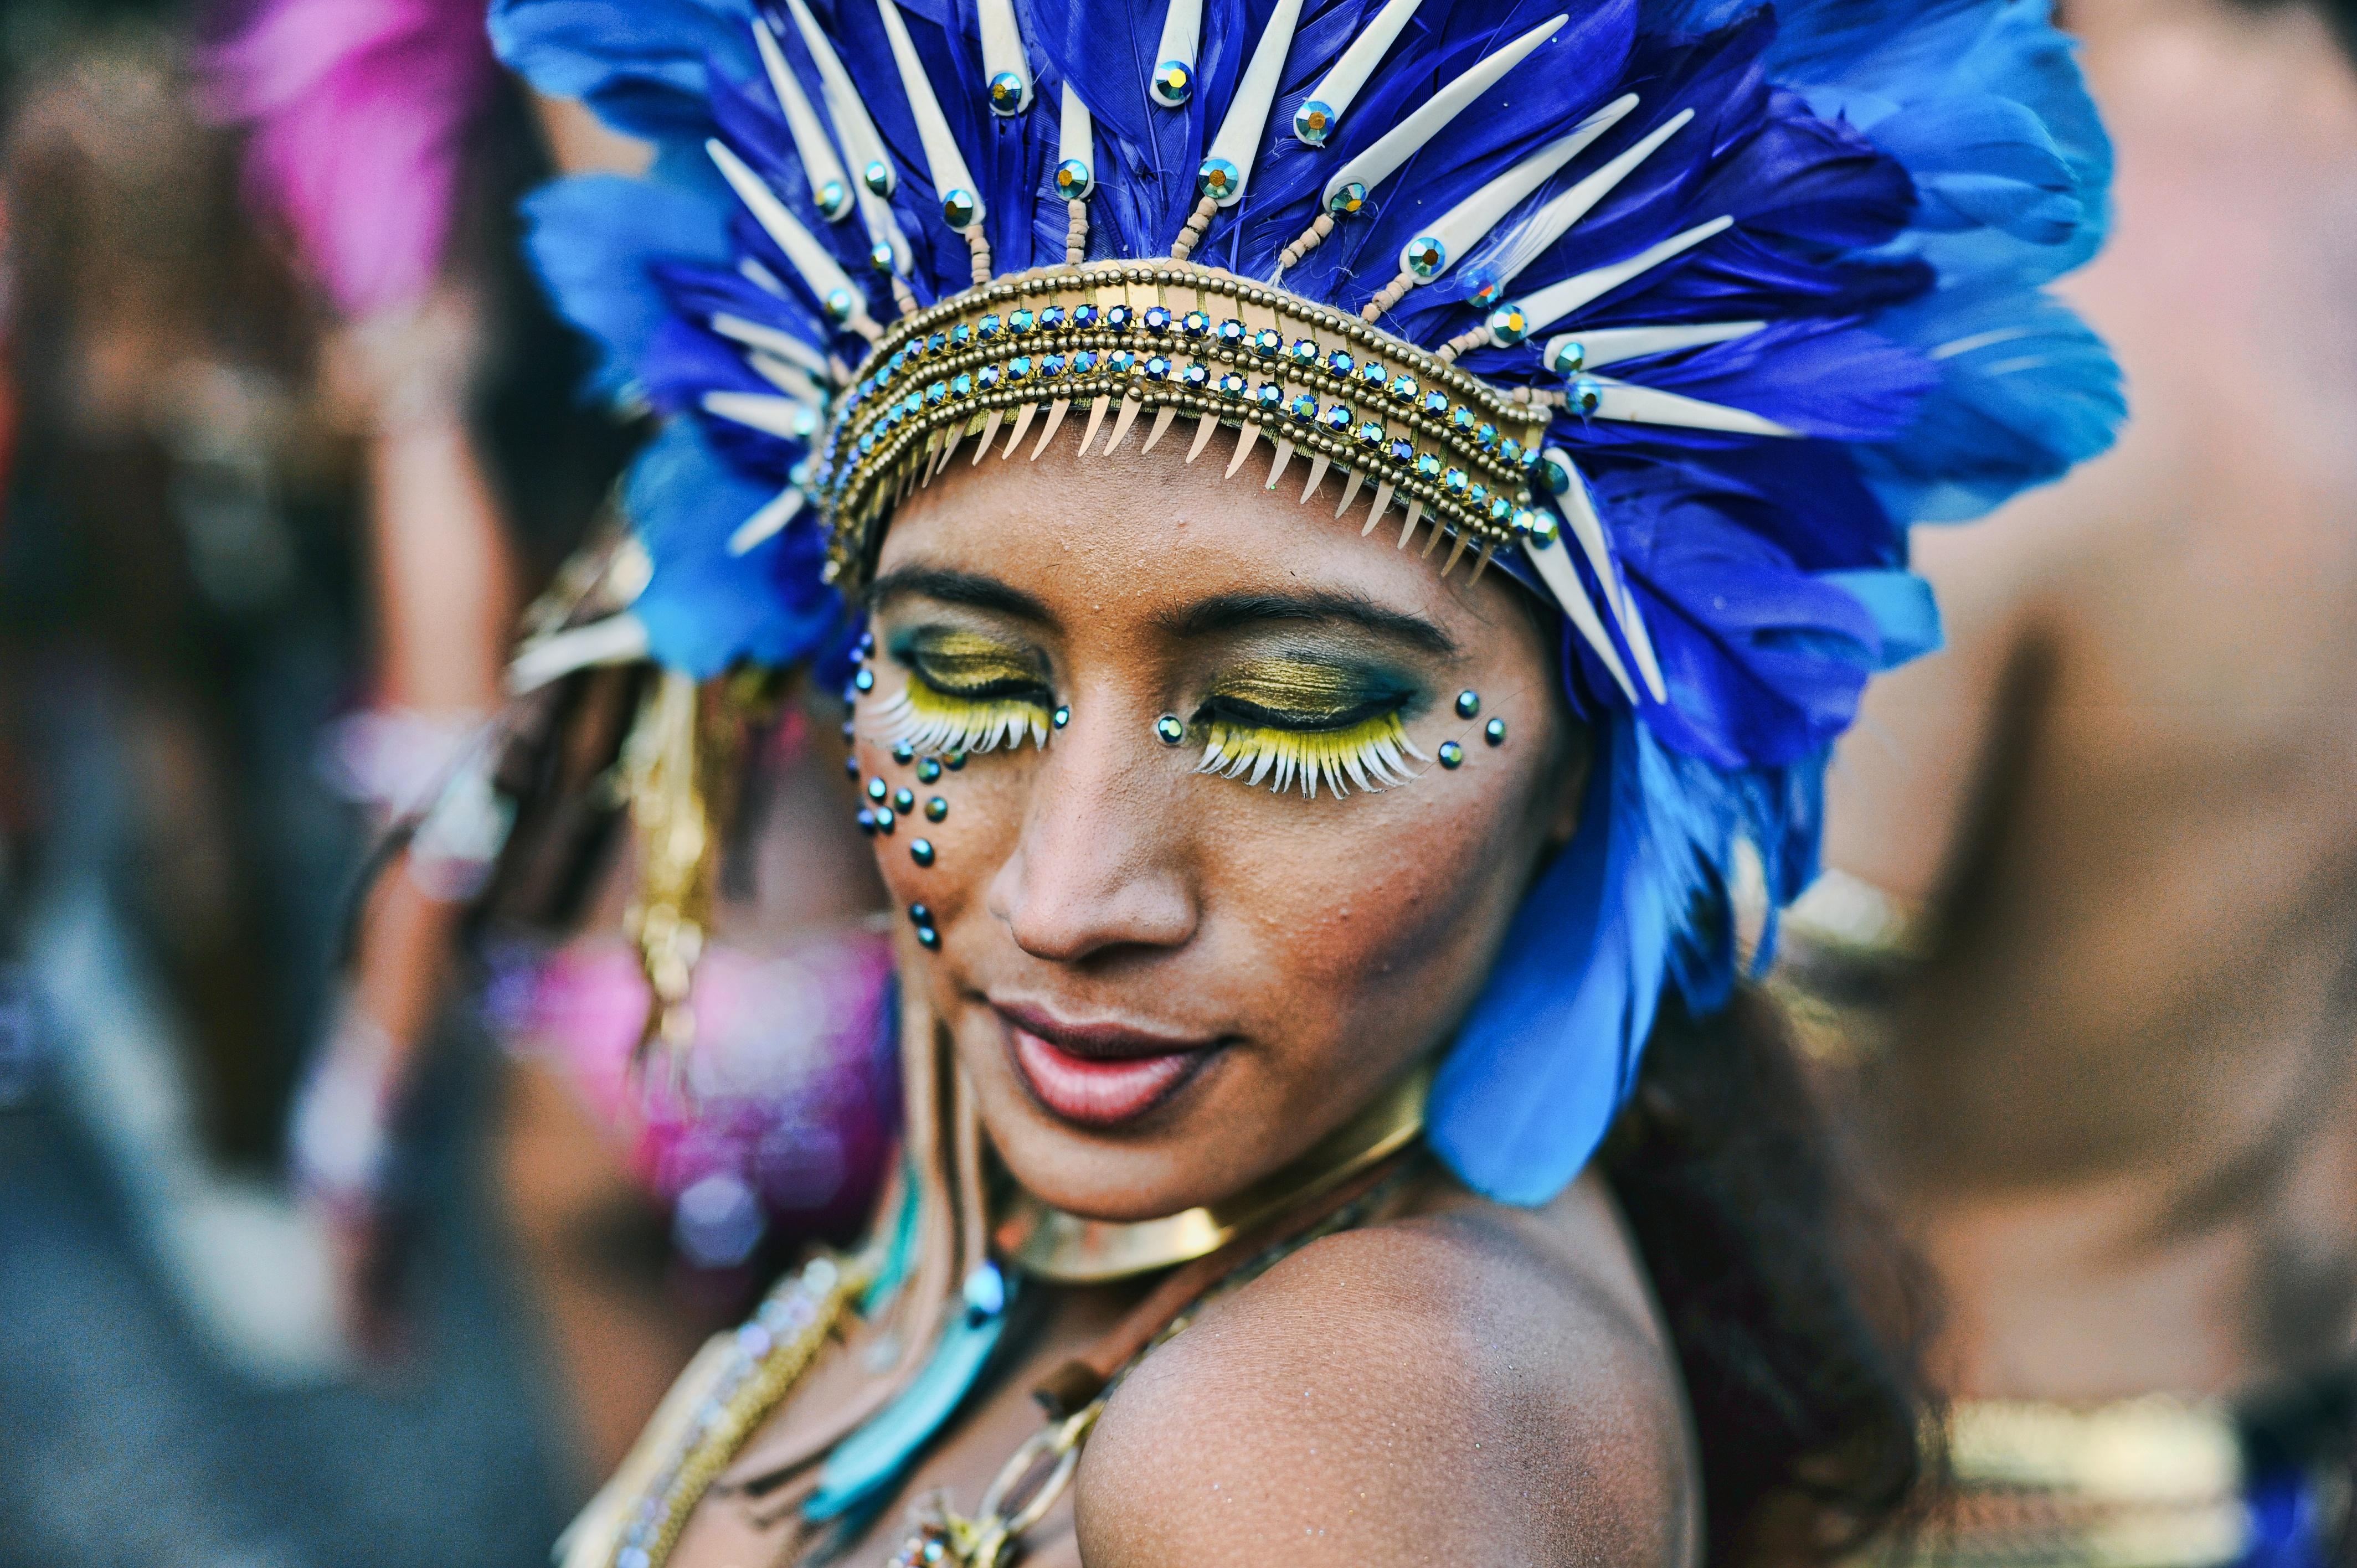 Kerron Riley|Caribbean Photographer